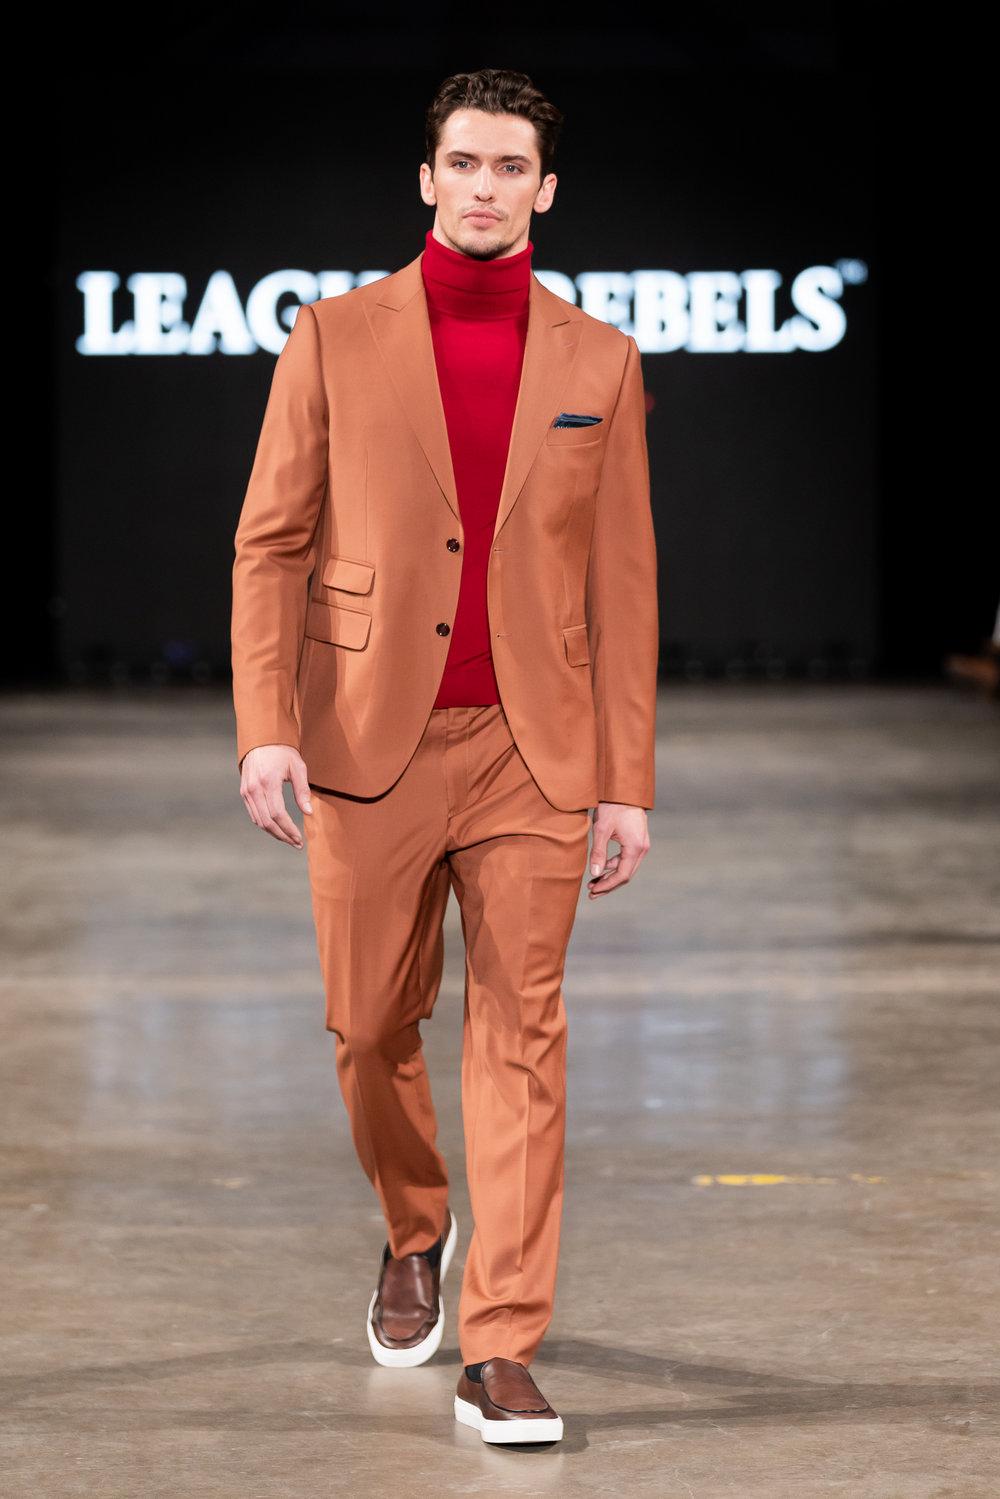 Austin Fashion Week Day 2 League of Rebels - MTM by Linn Images-9.jpg